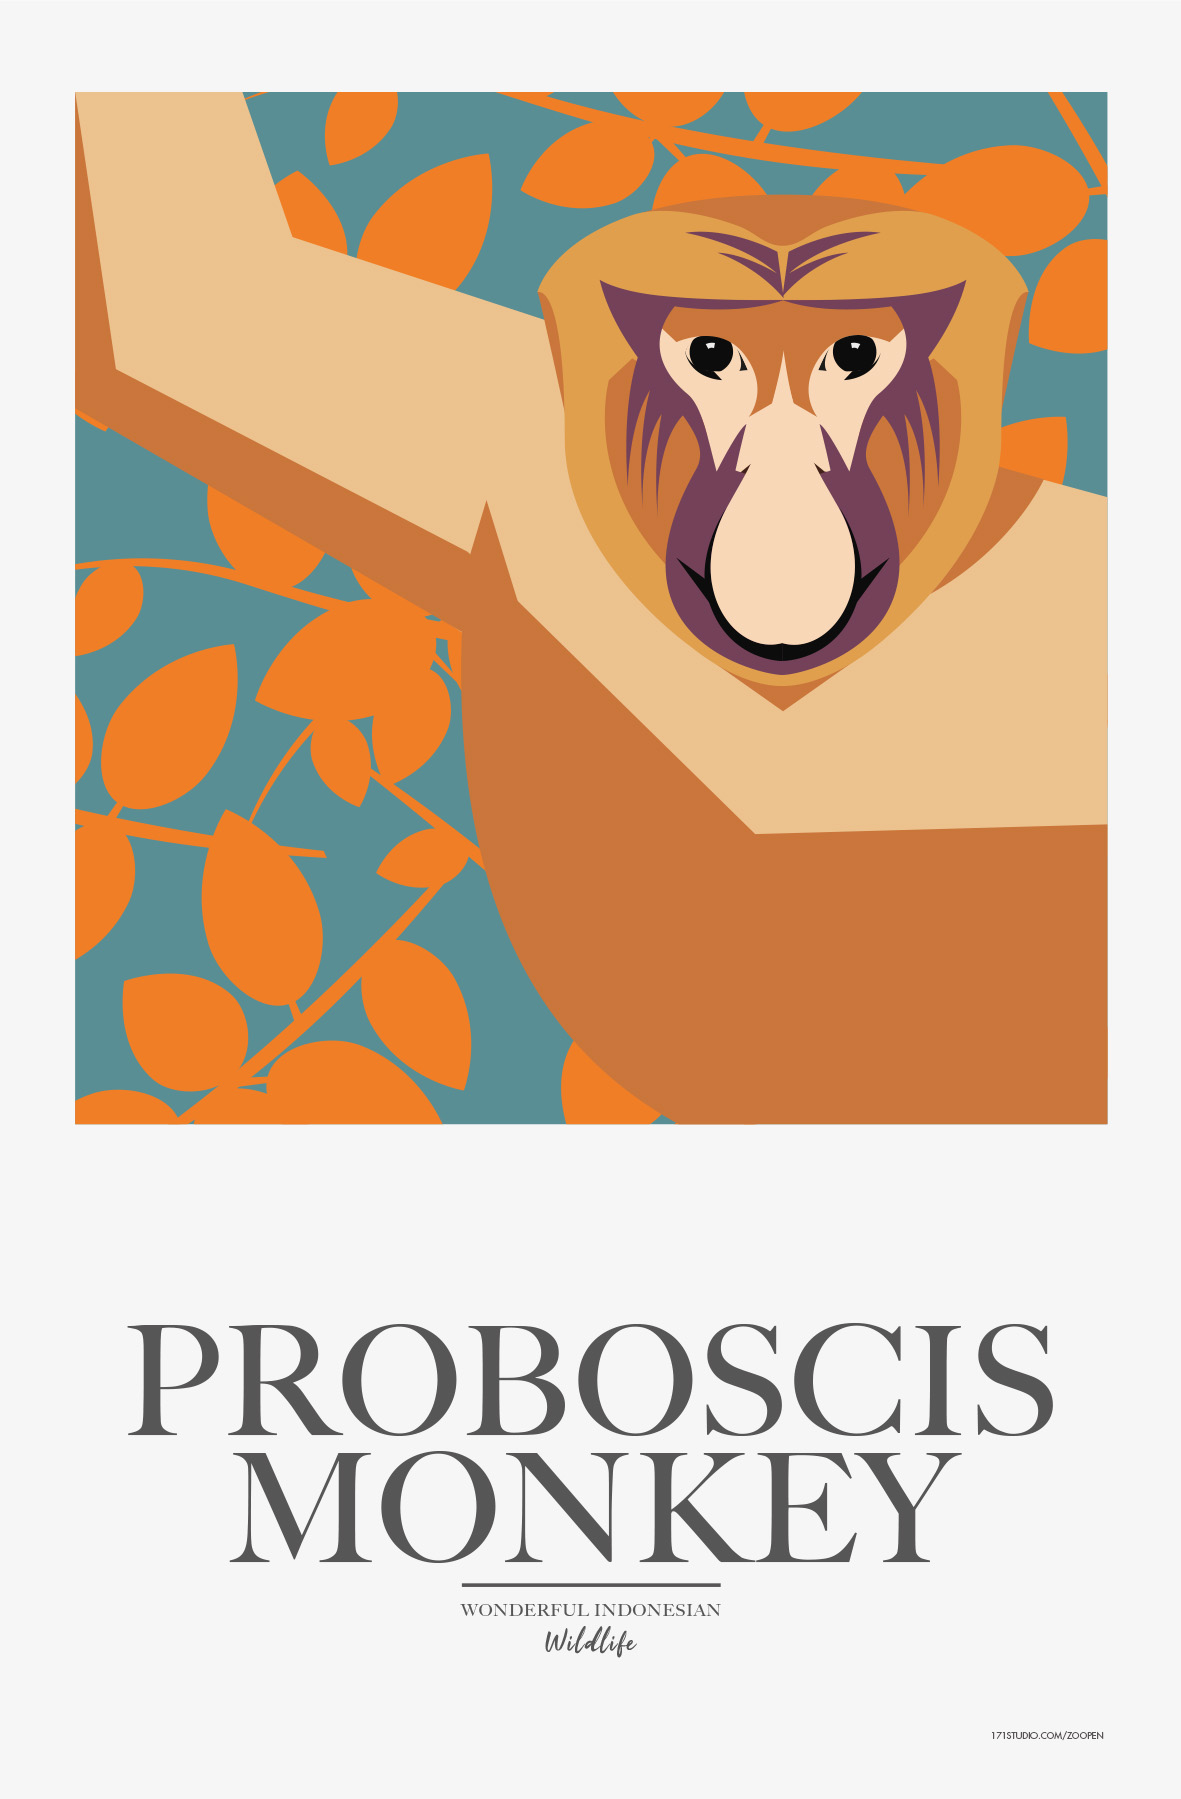 proboscismonkey171studiomathieusechet